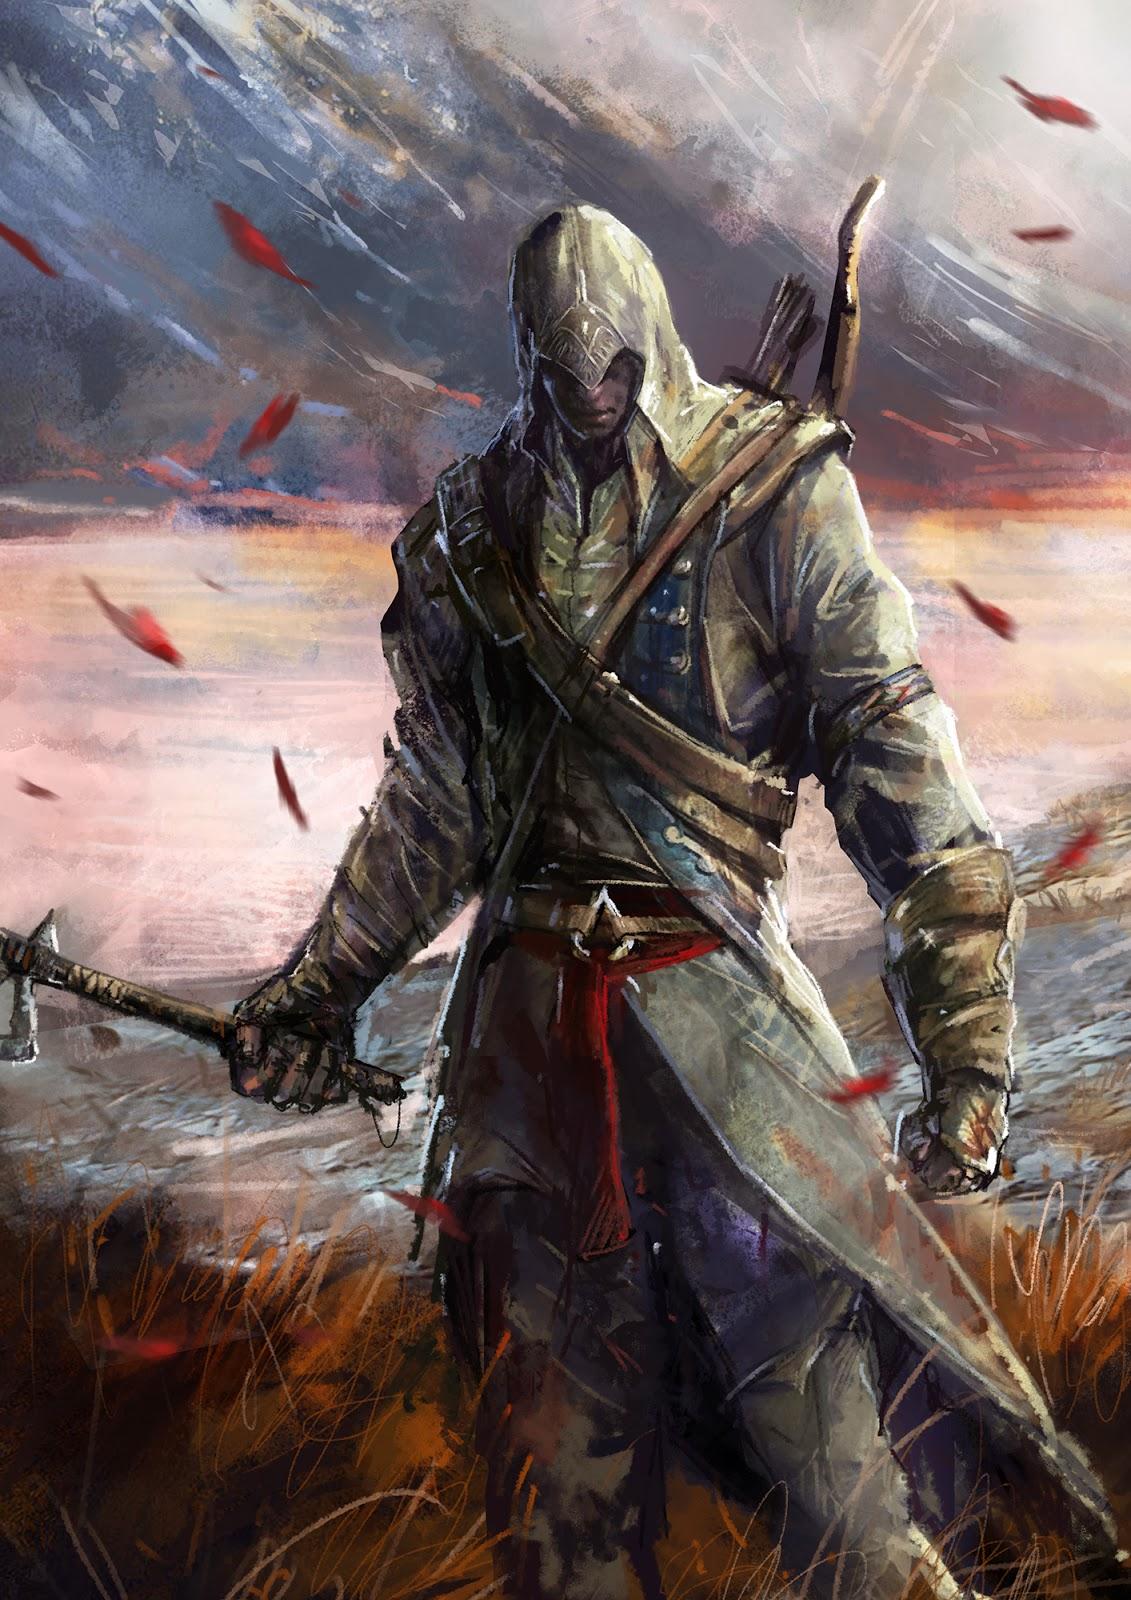 ArtStation - Assassins Creed Identity Characters, Andi Drude